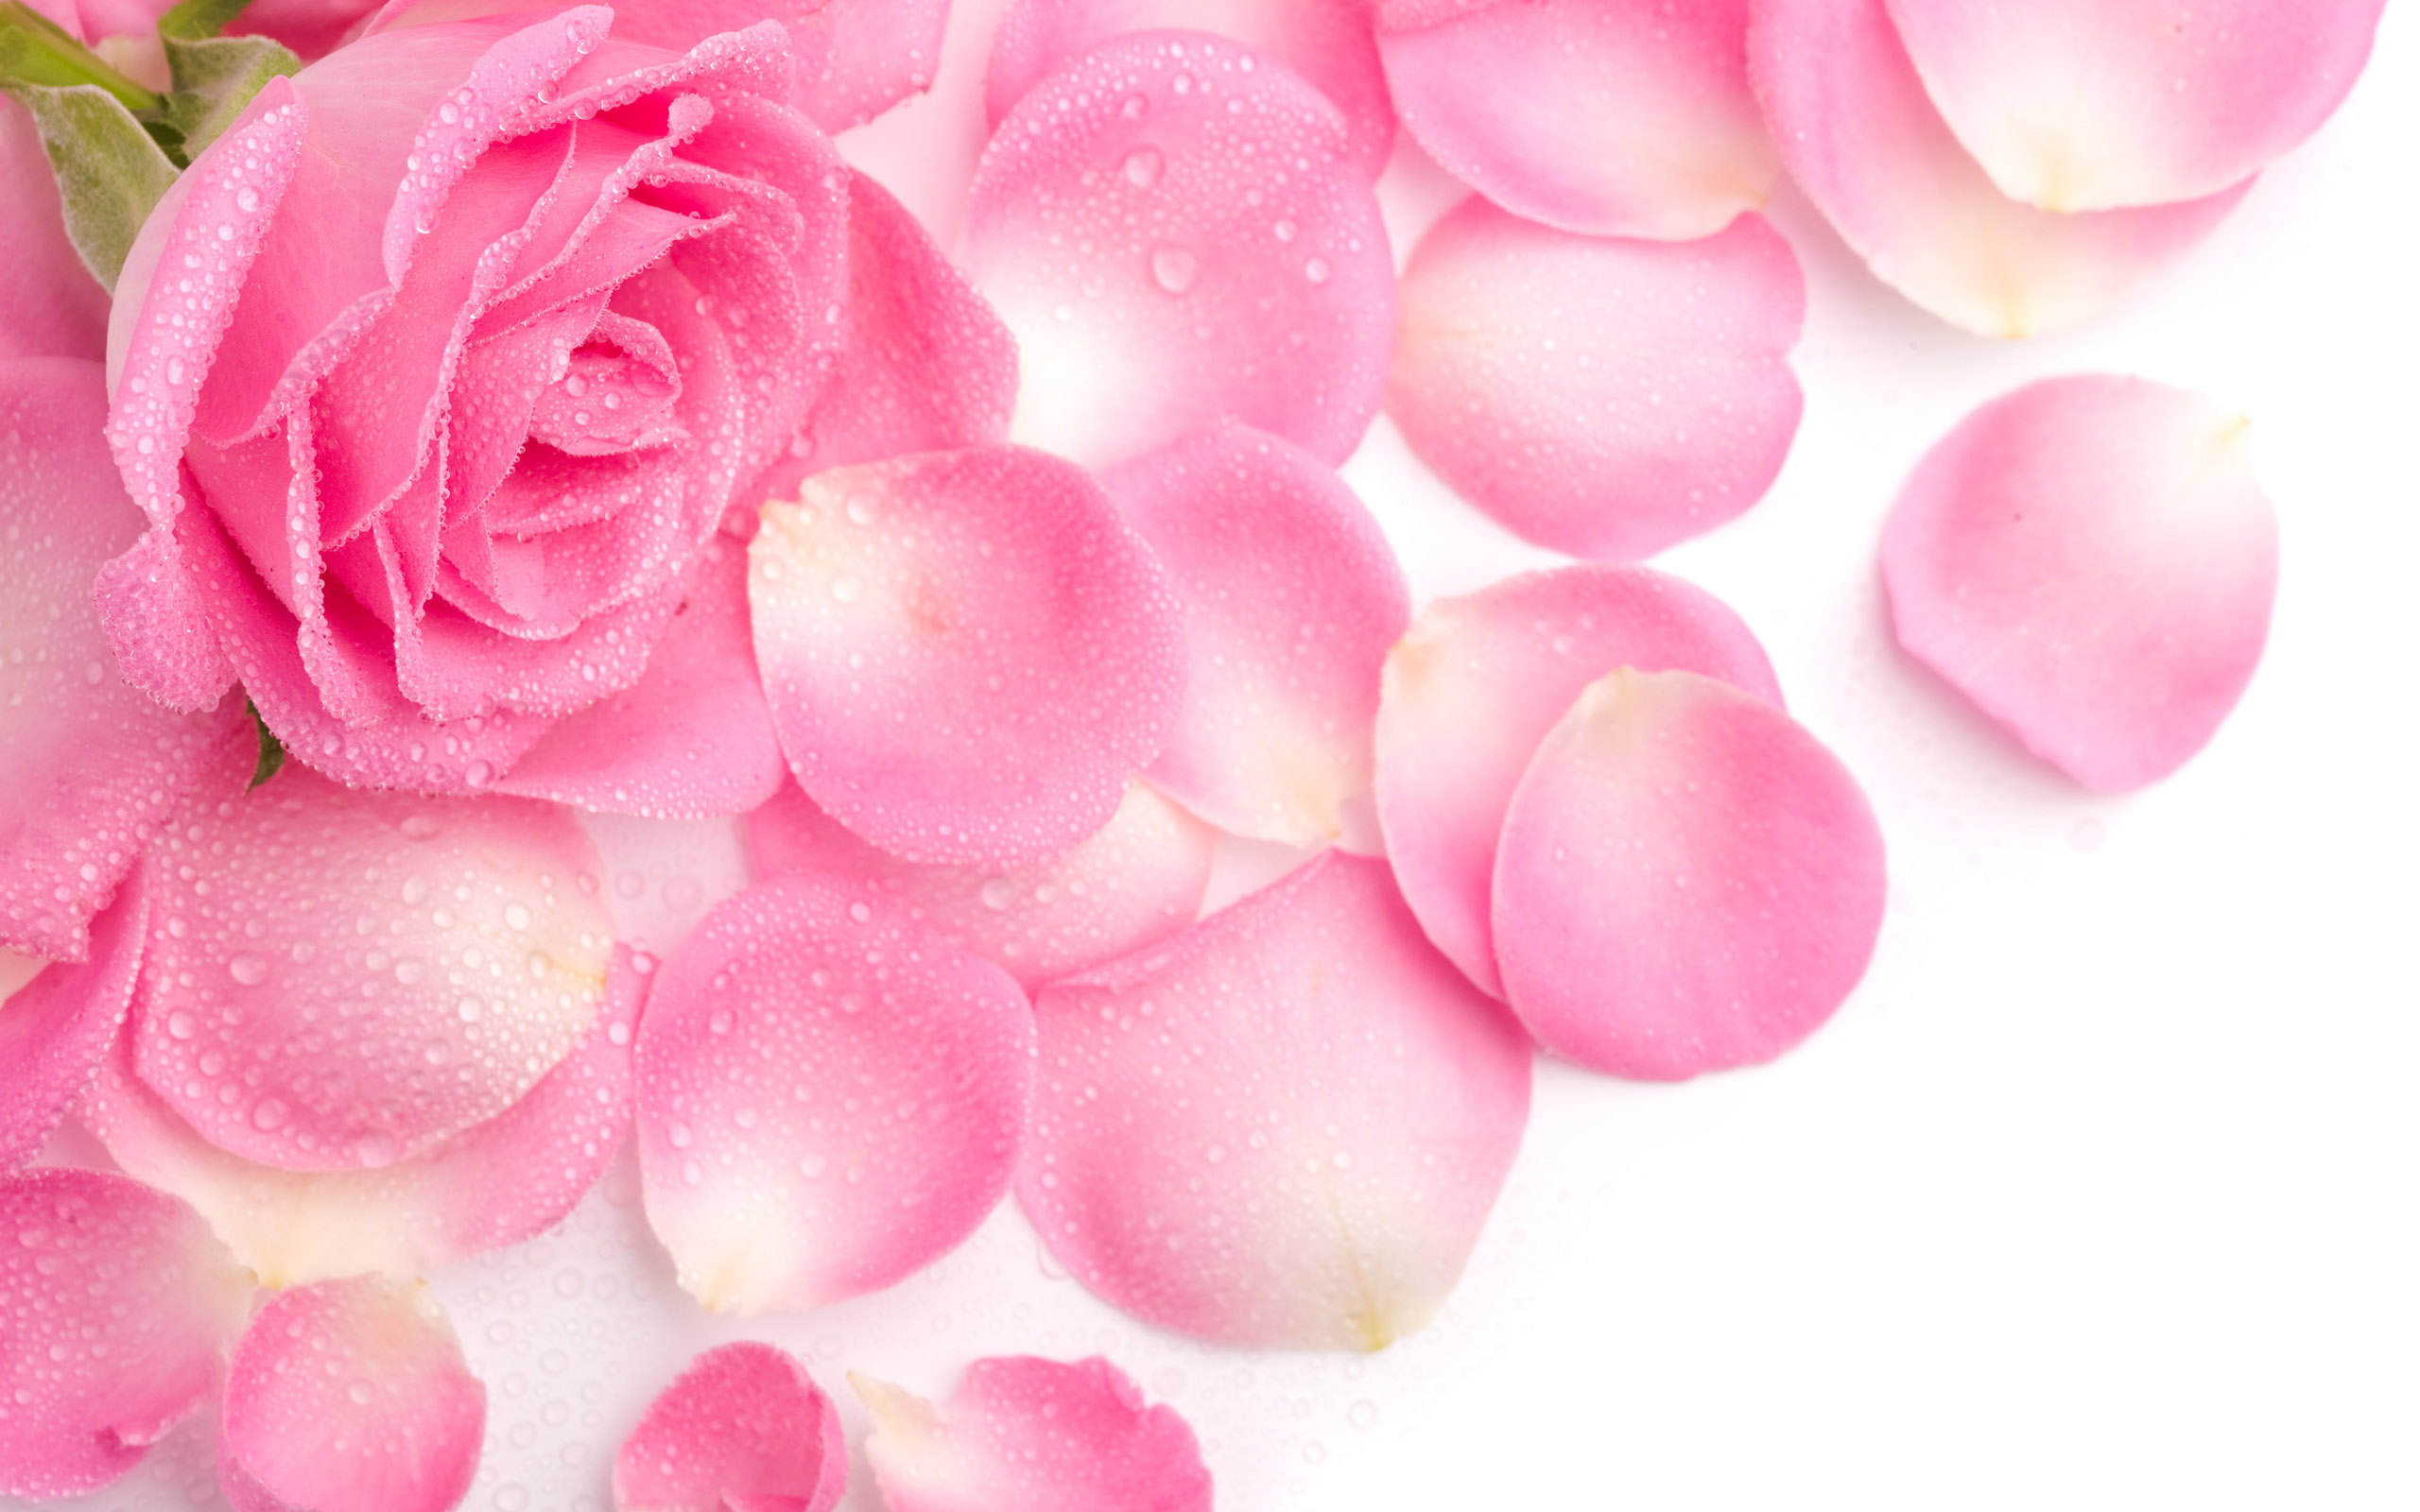 Cute Love Wallpapers CollectionsDesktop Wallpapers collectionLaptop 2560x1600